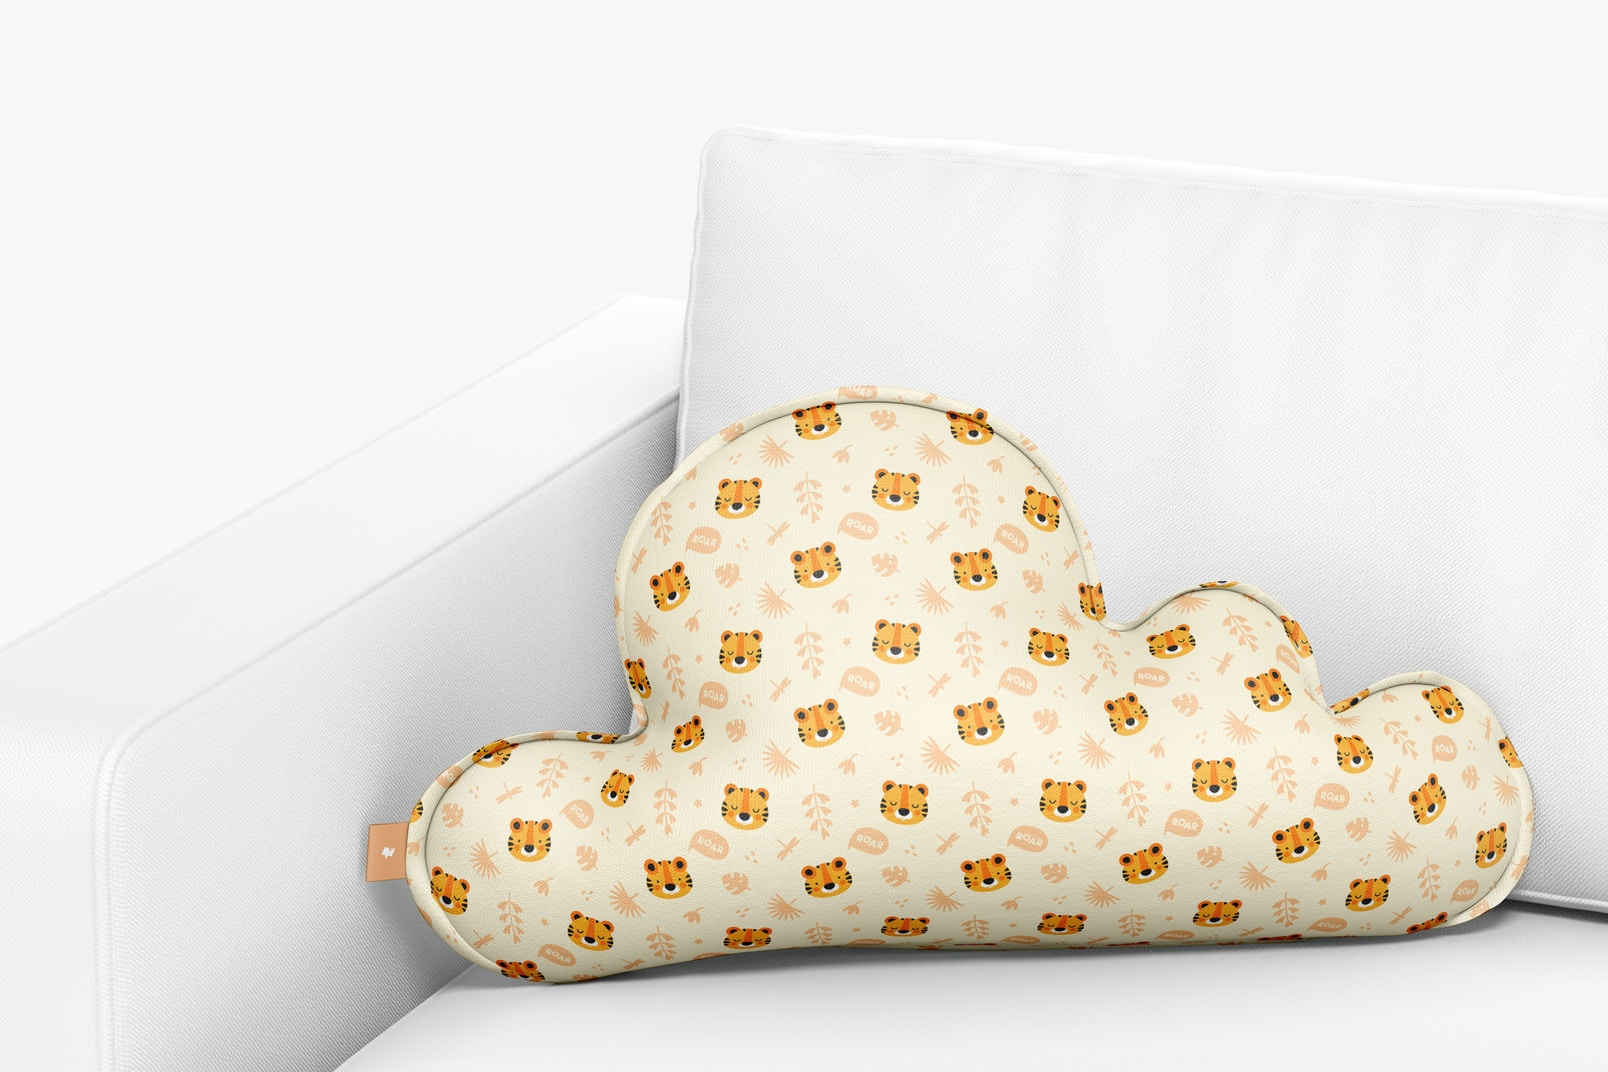 Cloud Pillow on Sofa Mockup